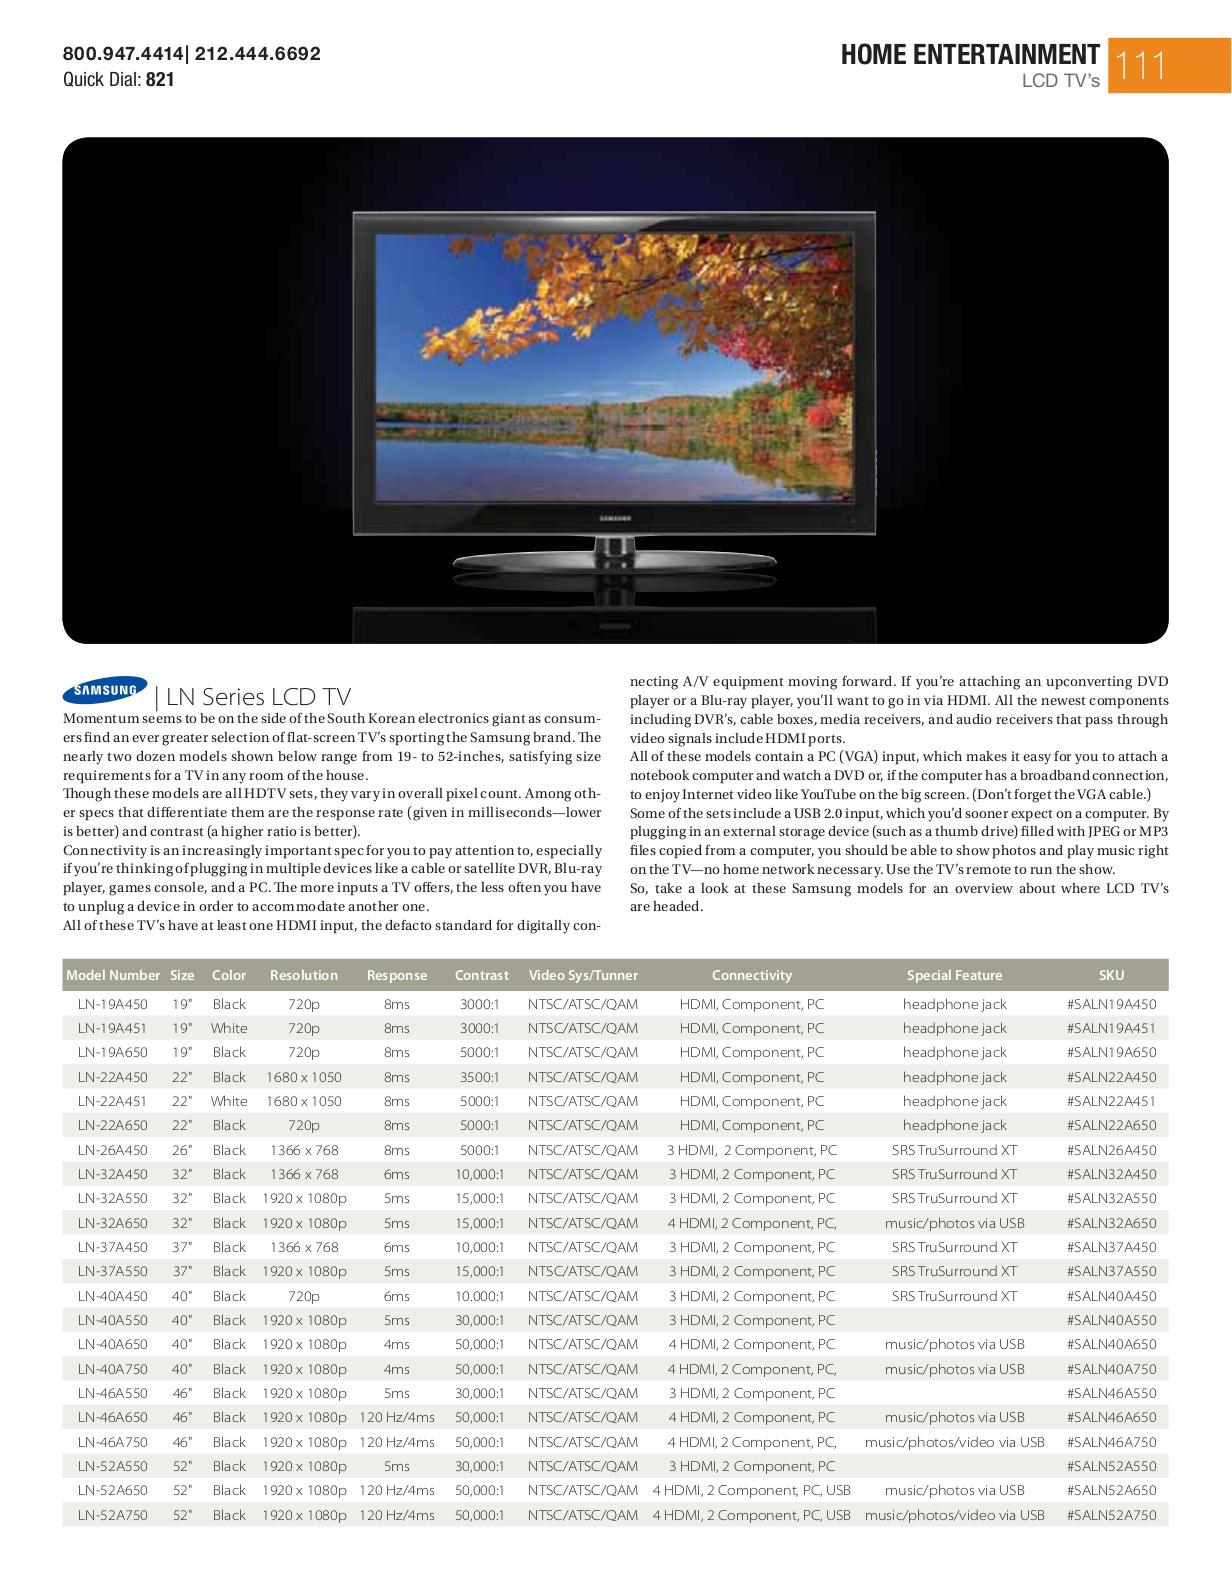 pdf manual for toshiba tv 37av500u rh umlib com toshiba 37av500u service manual Toshiba E-Studio203sd Manuals